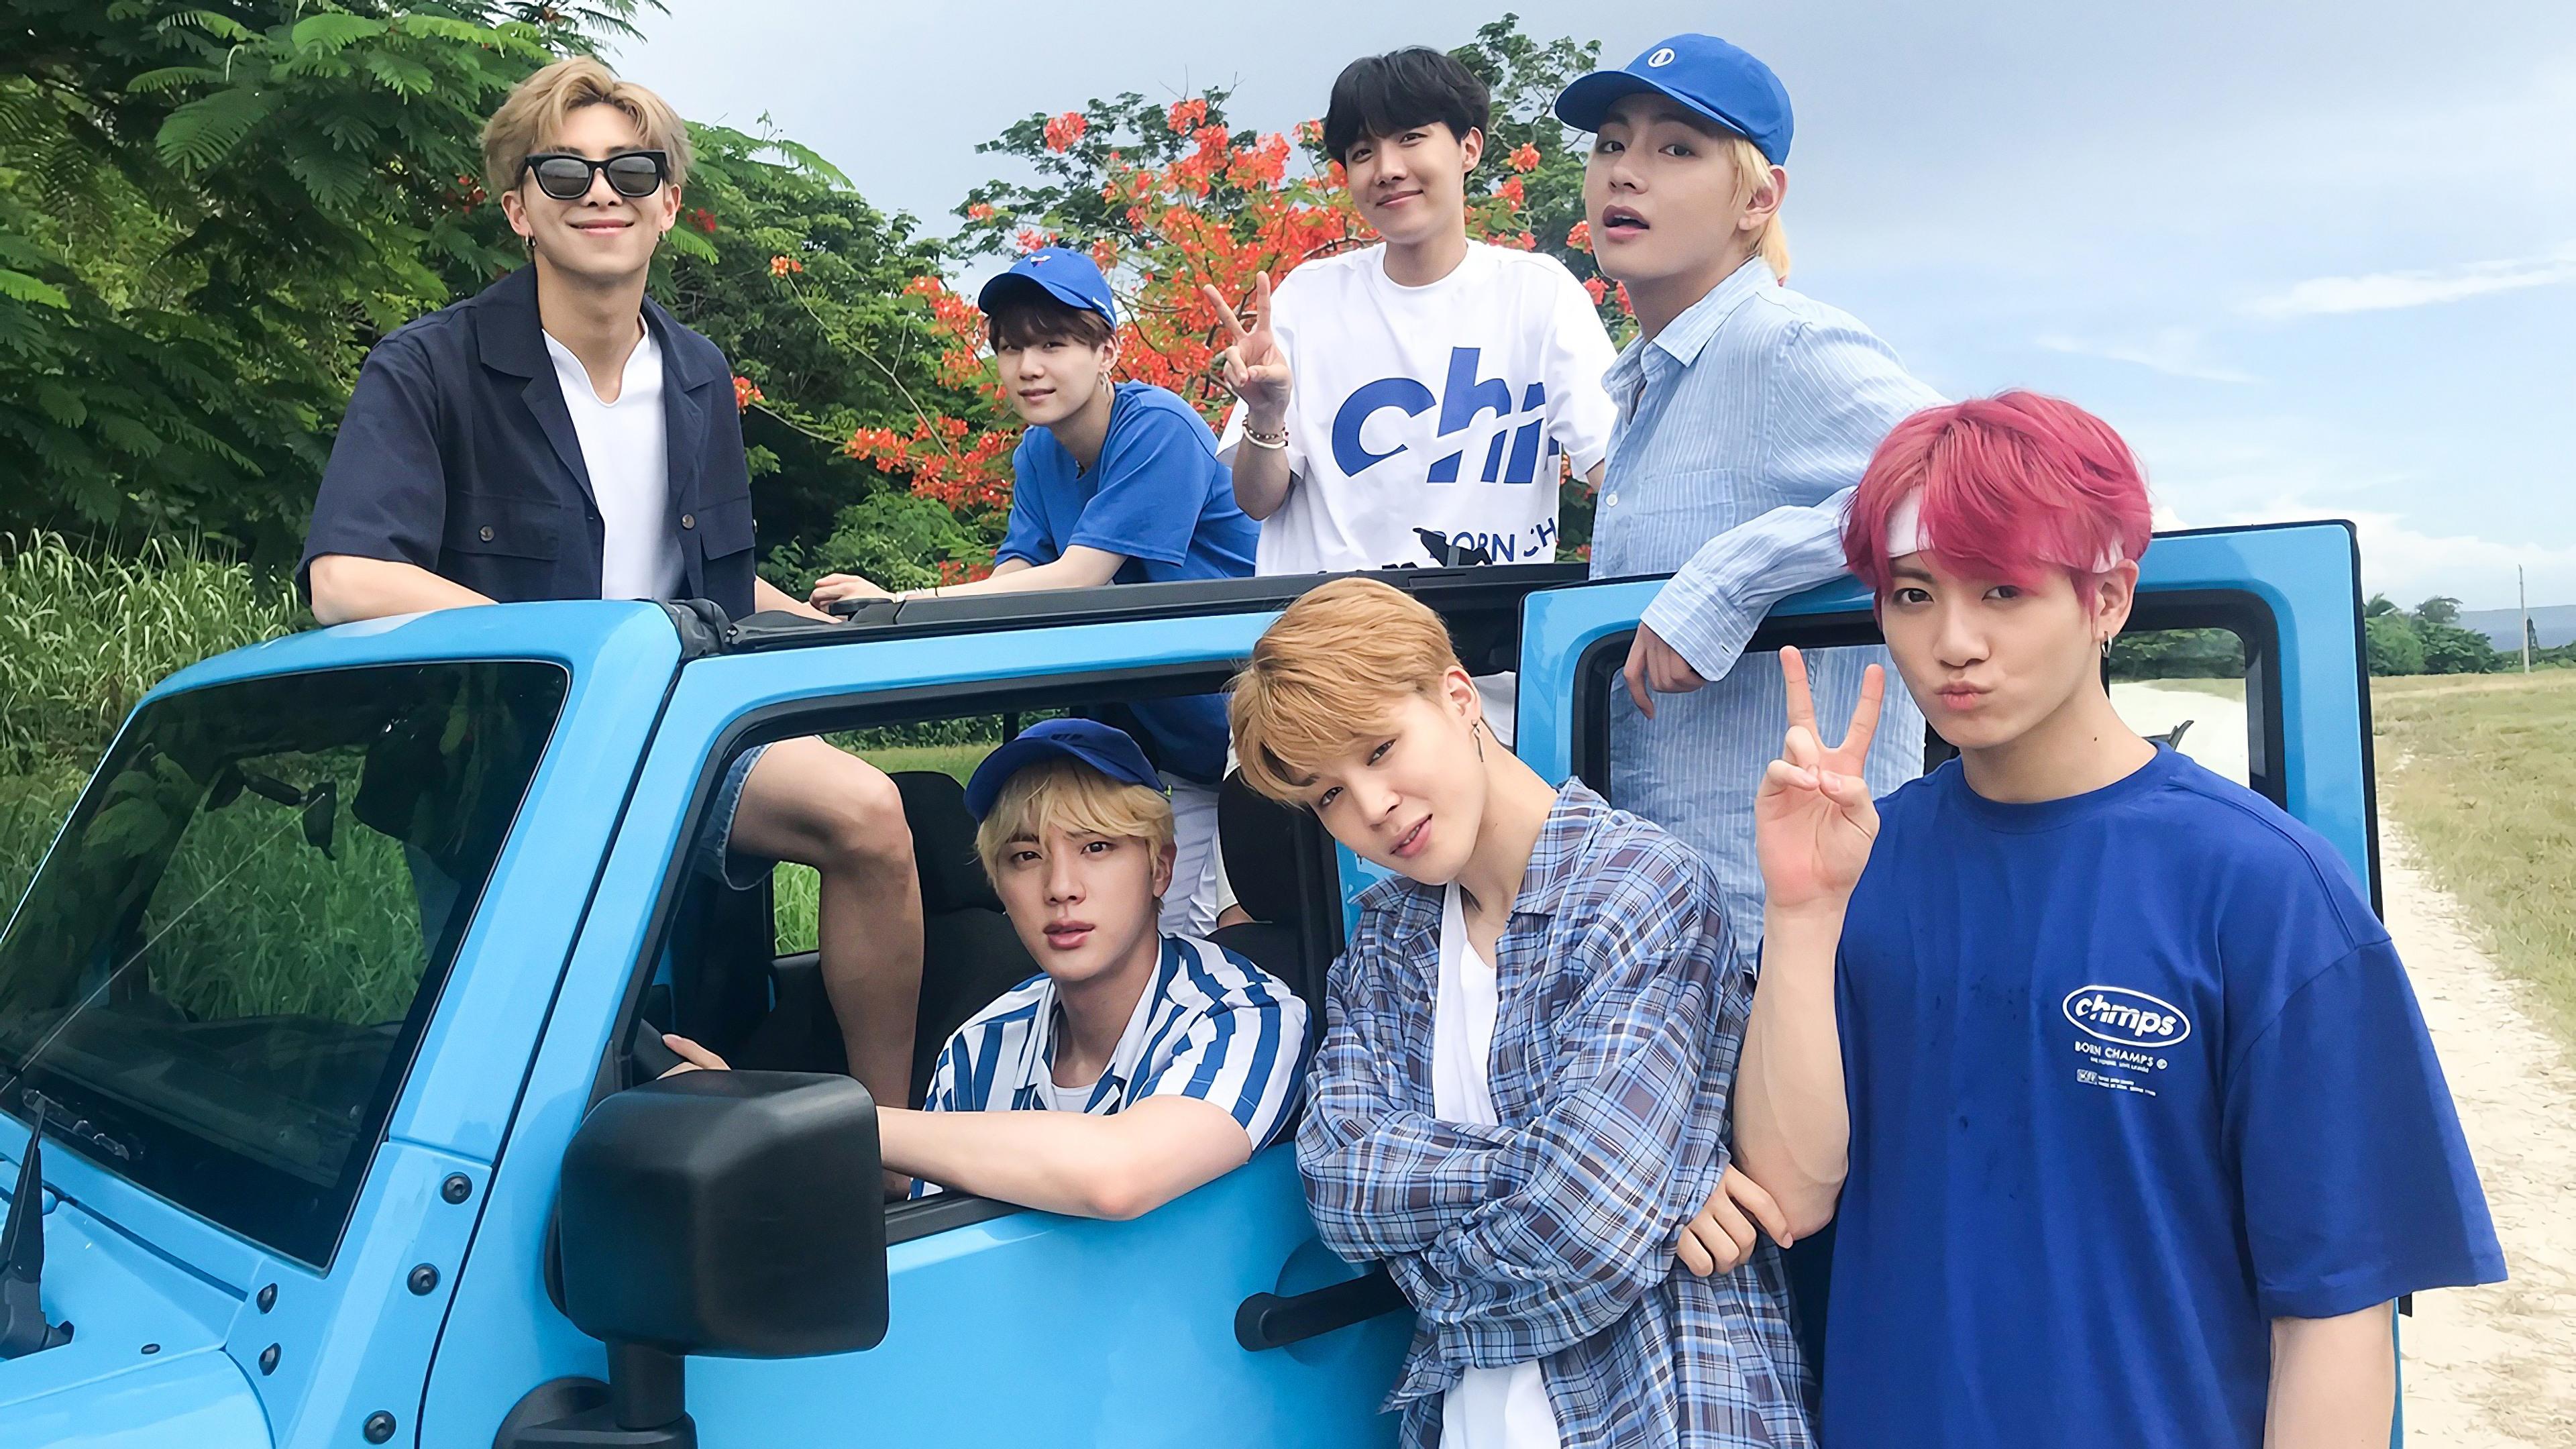 BTS Group Members Jungkook Jimin V Jin RM J Hope Suga 4K 22026 3840x2160